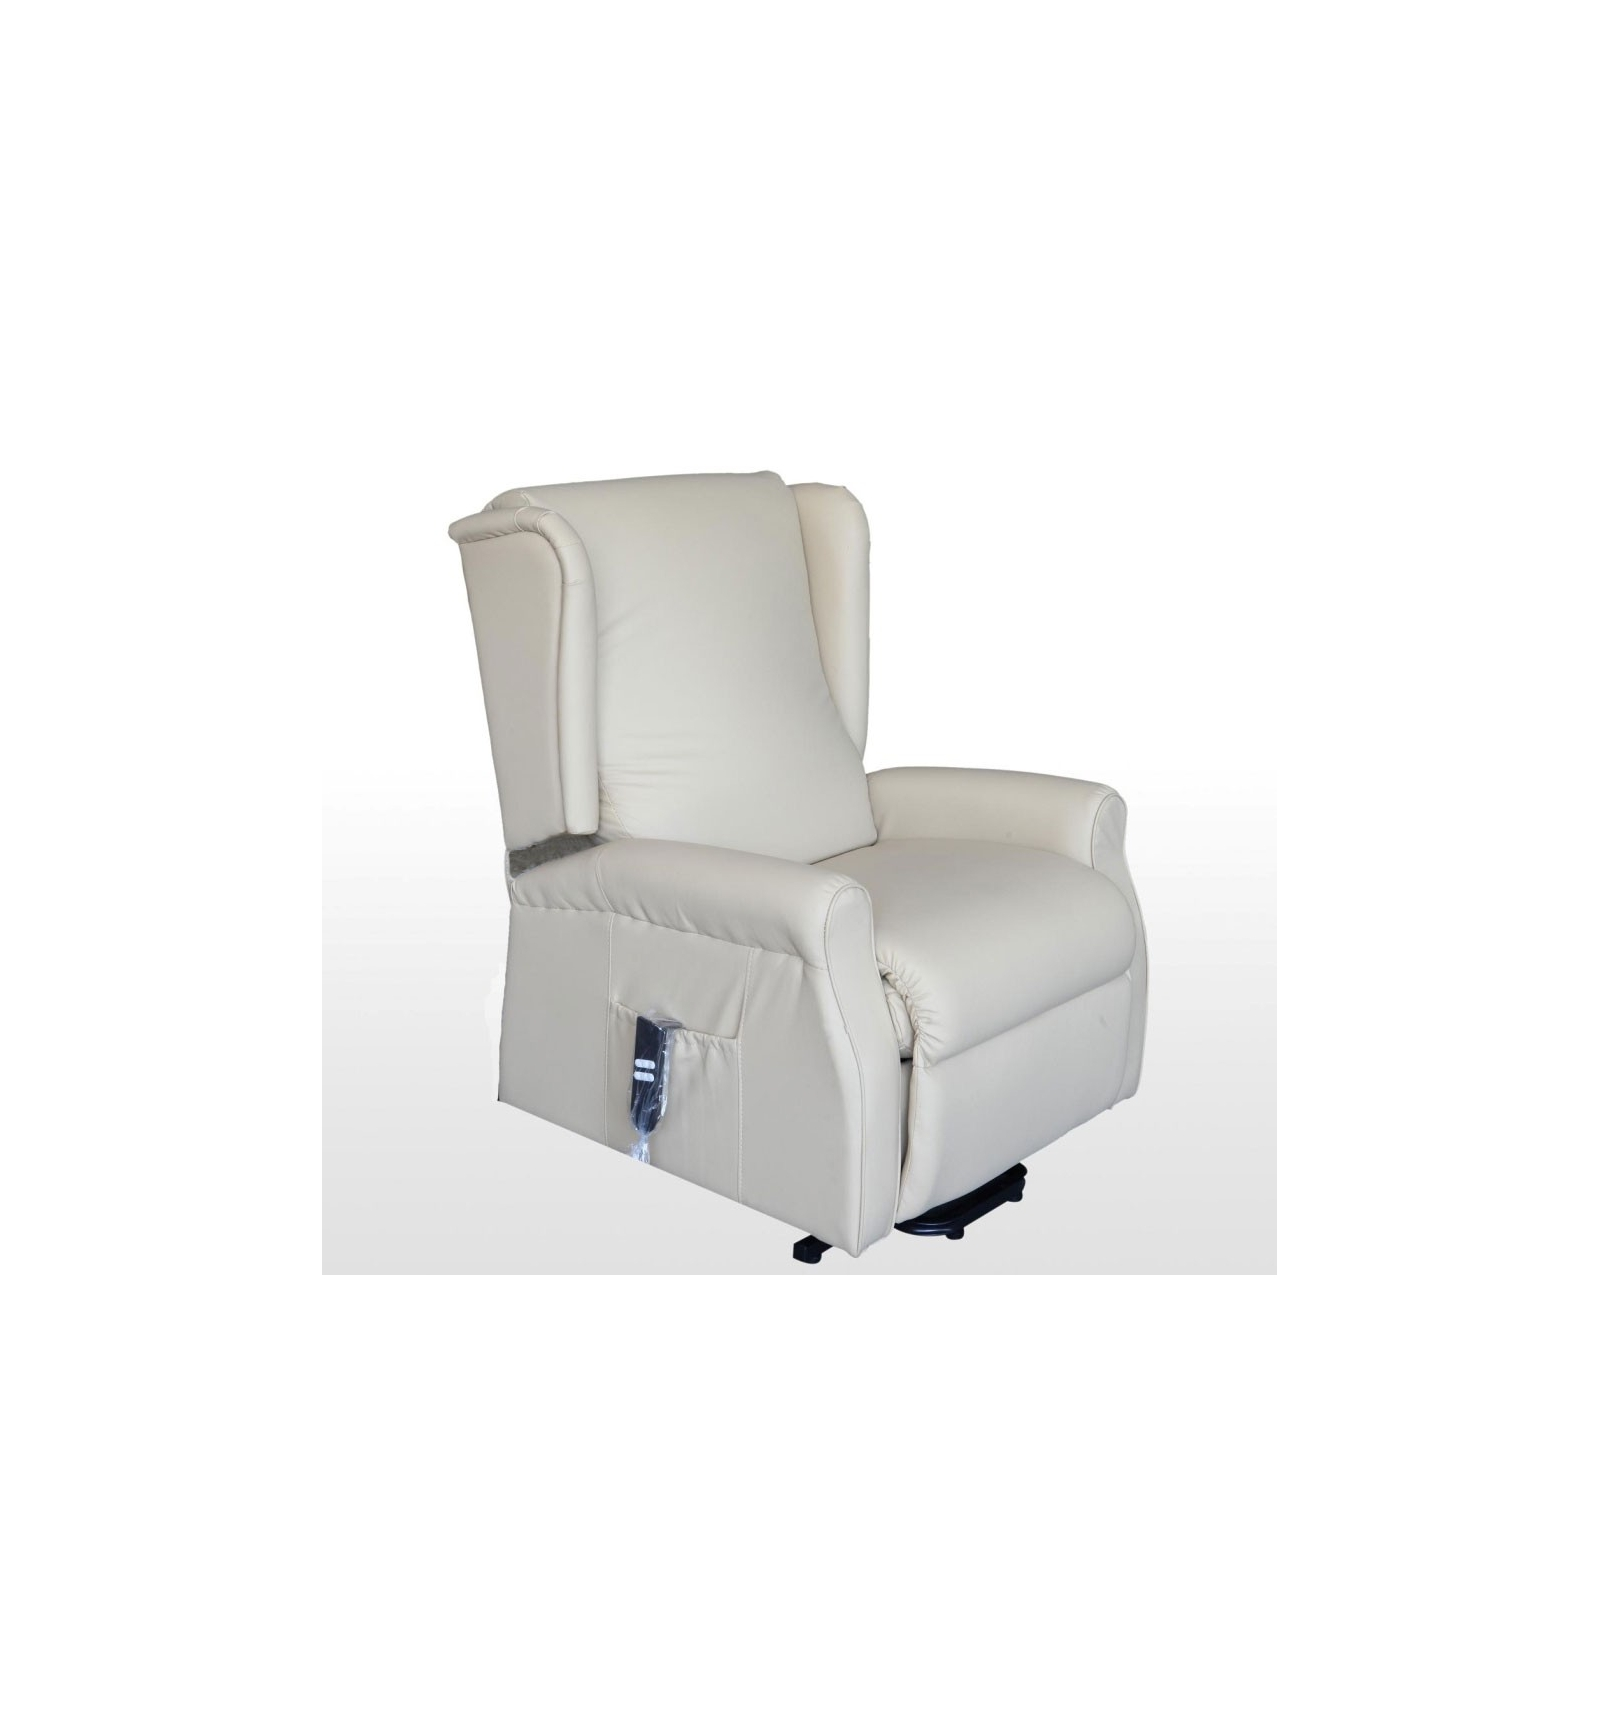 fauteuil relax elevateur. Black Bedroom Furniture Sets. Home Design Ideas